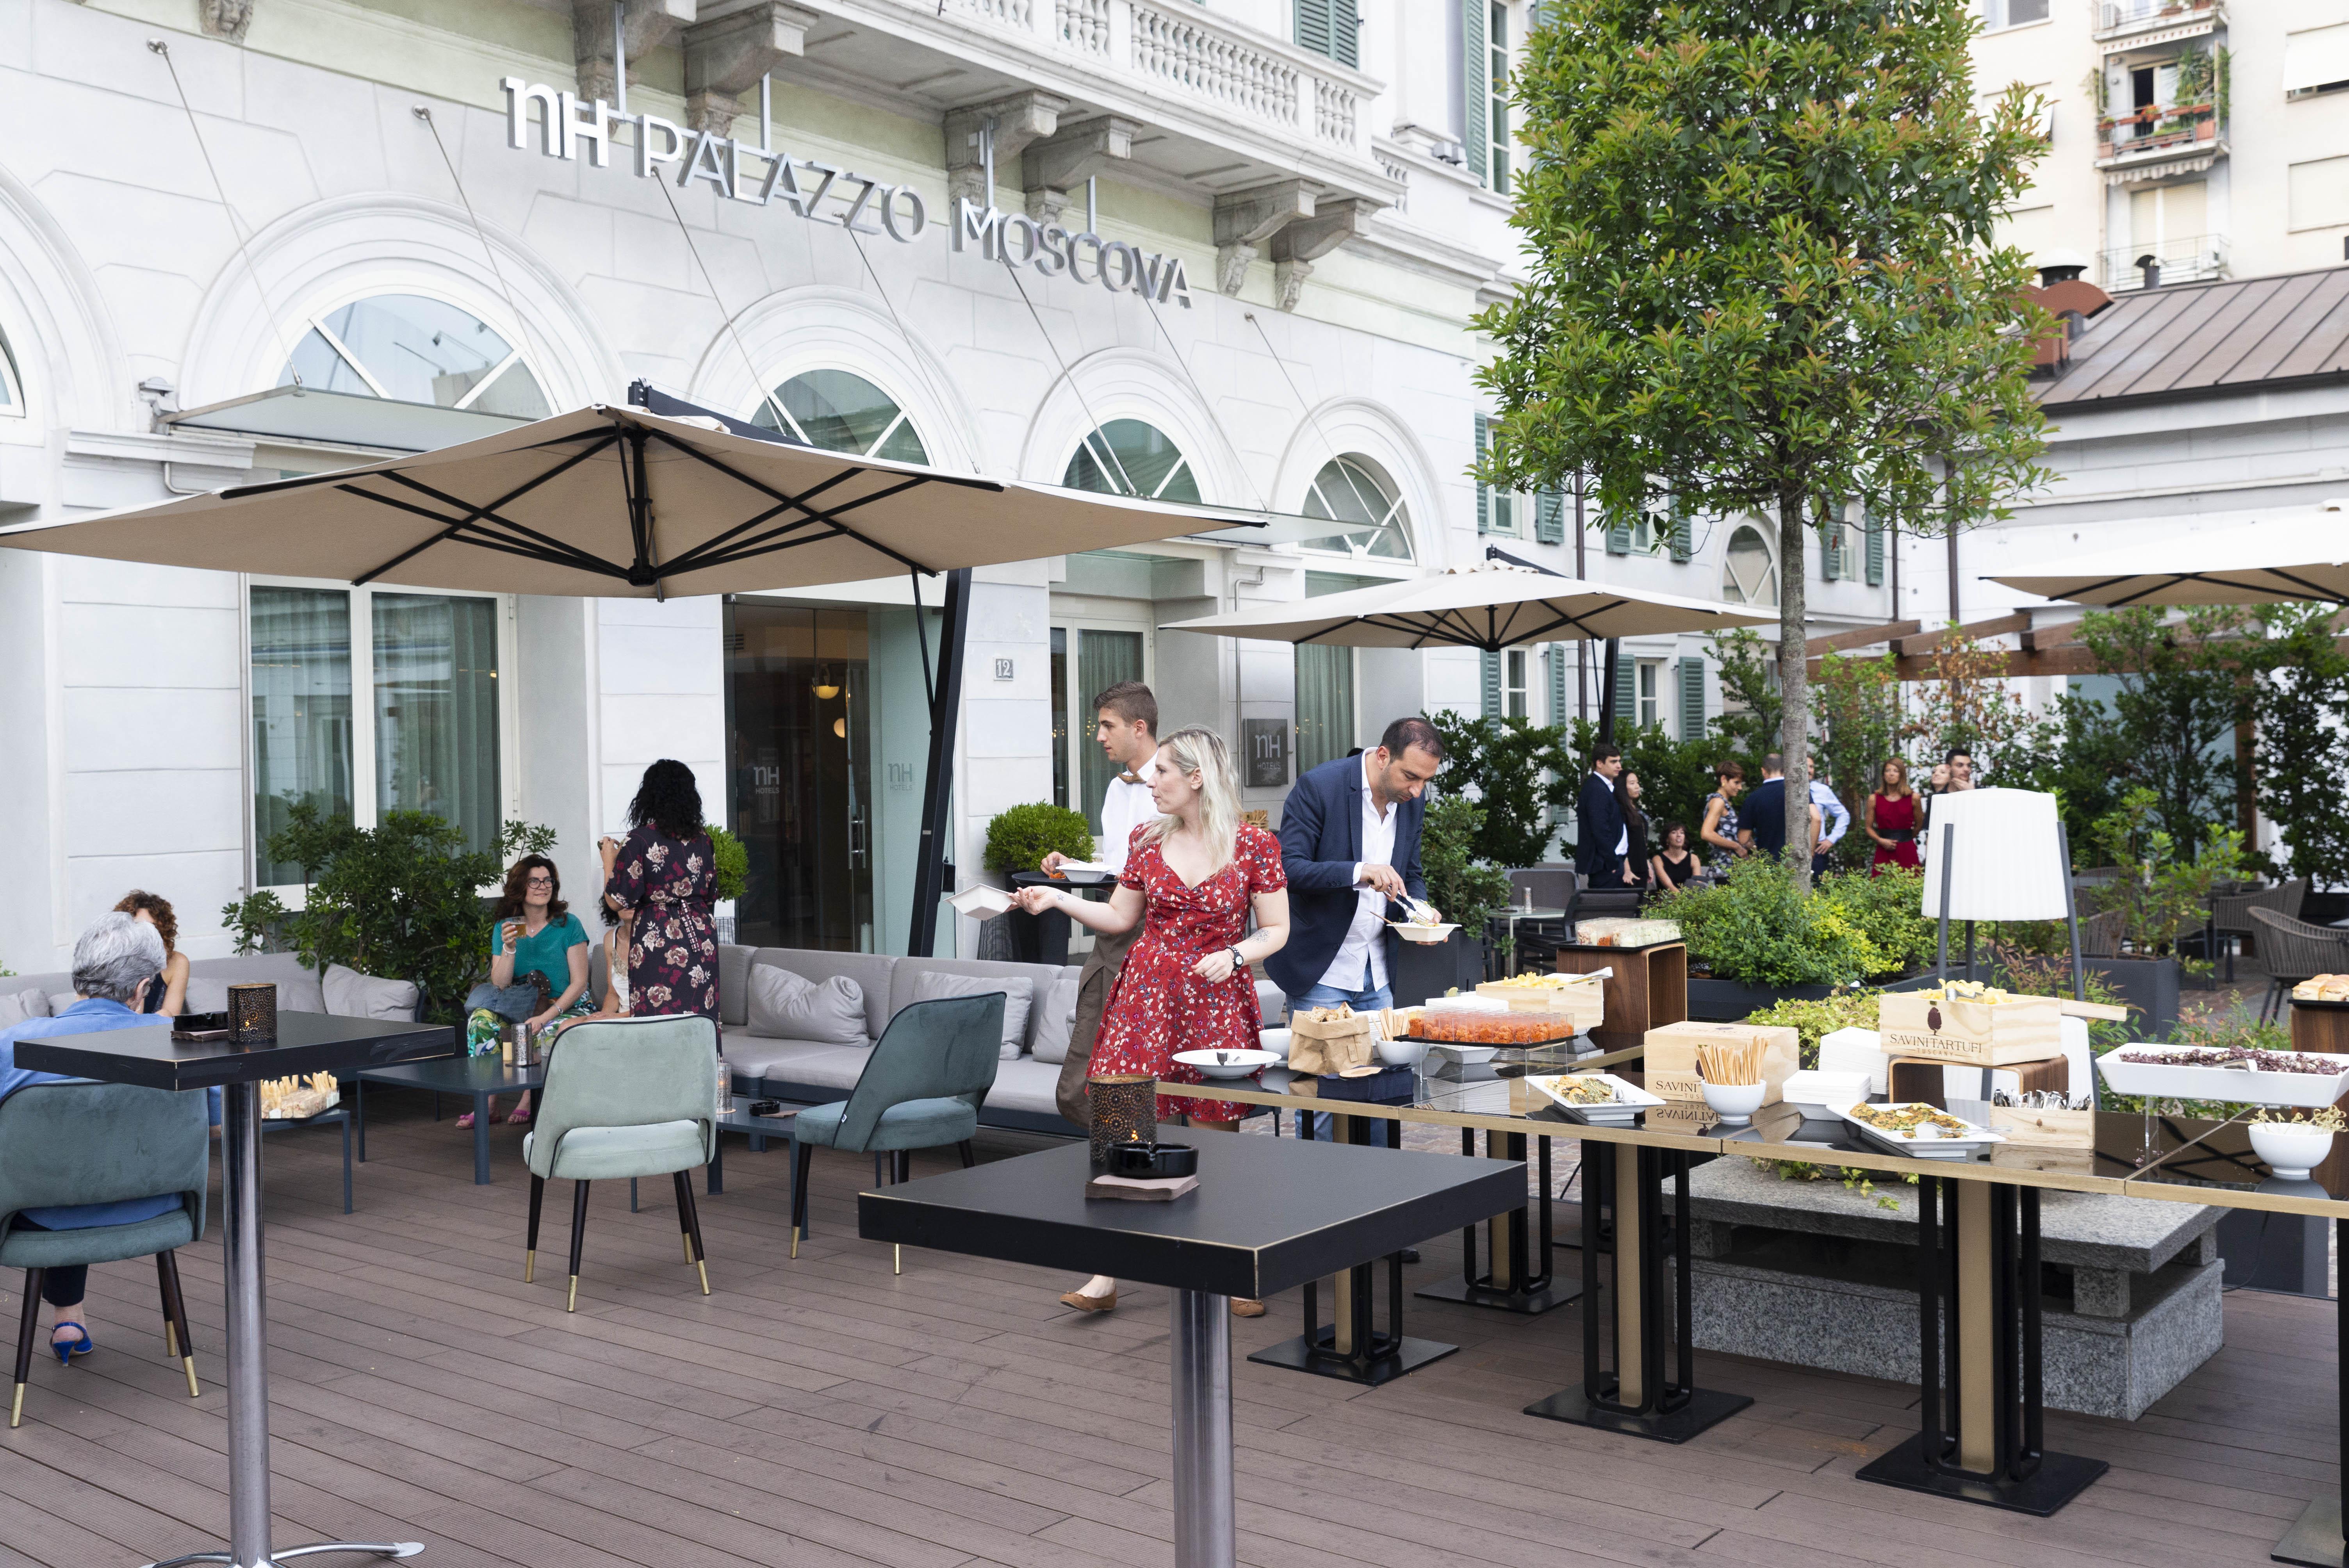 Thursday Terrace Moscova | YOUparti cocktail e degustazione savini tartufi